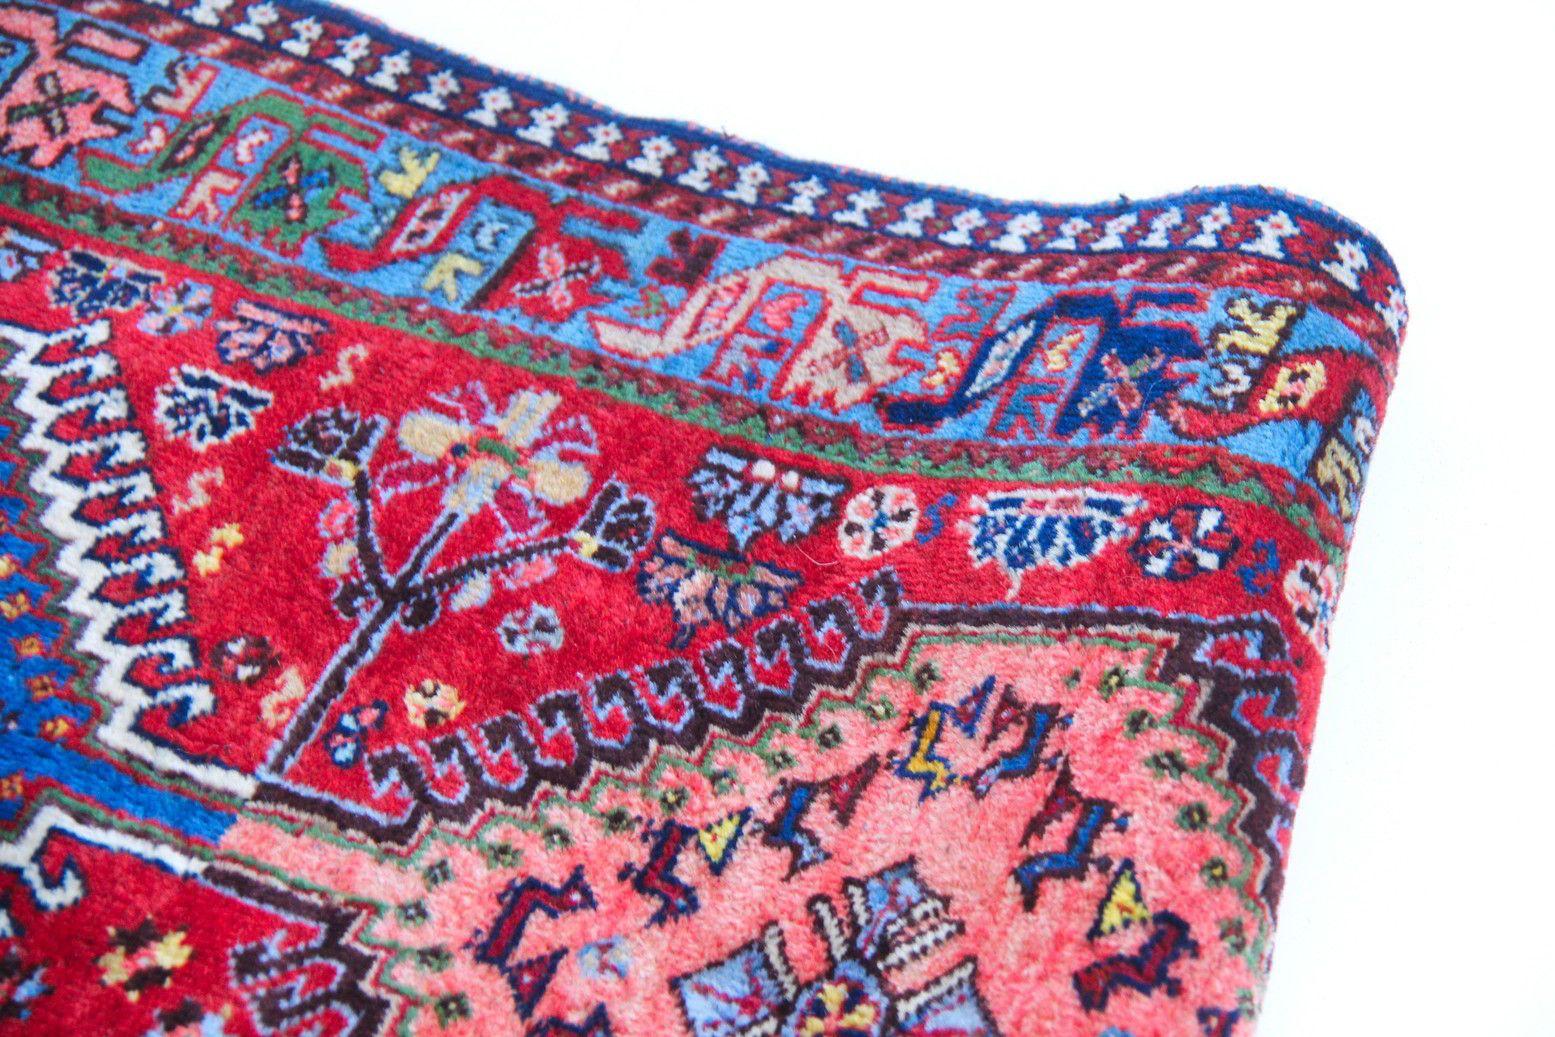 CP-1_Qashqai rug, Nomadic Persian Carpet_1 kom (2)